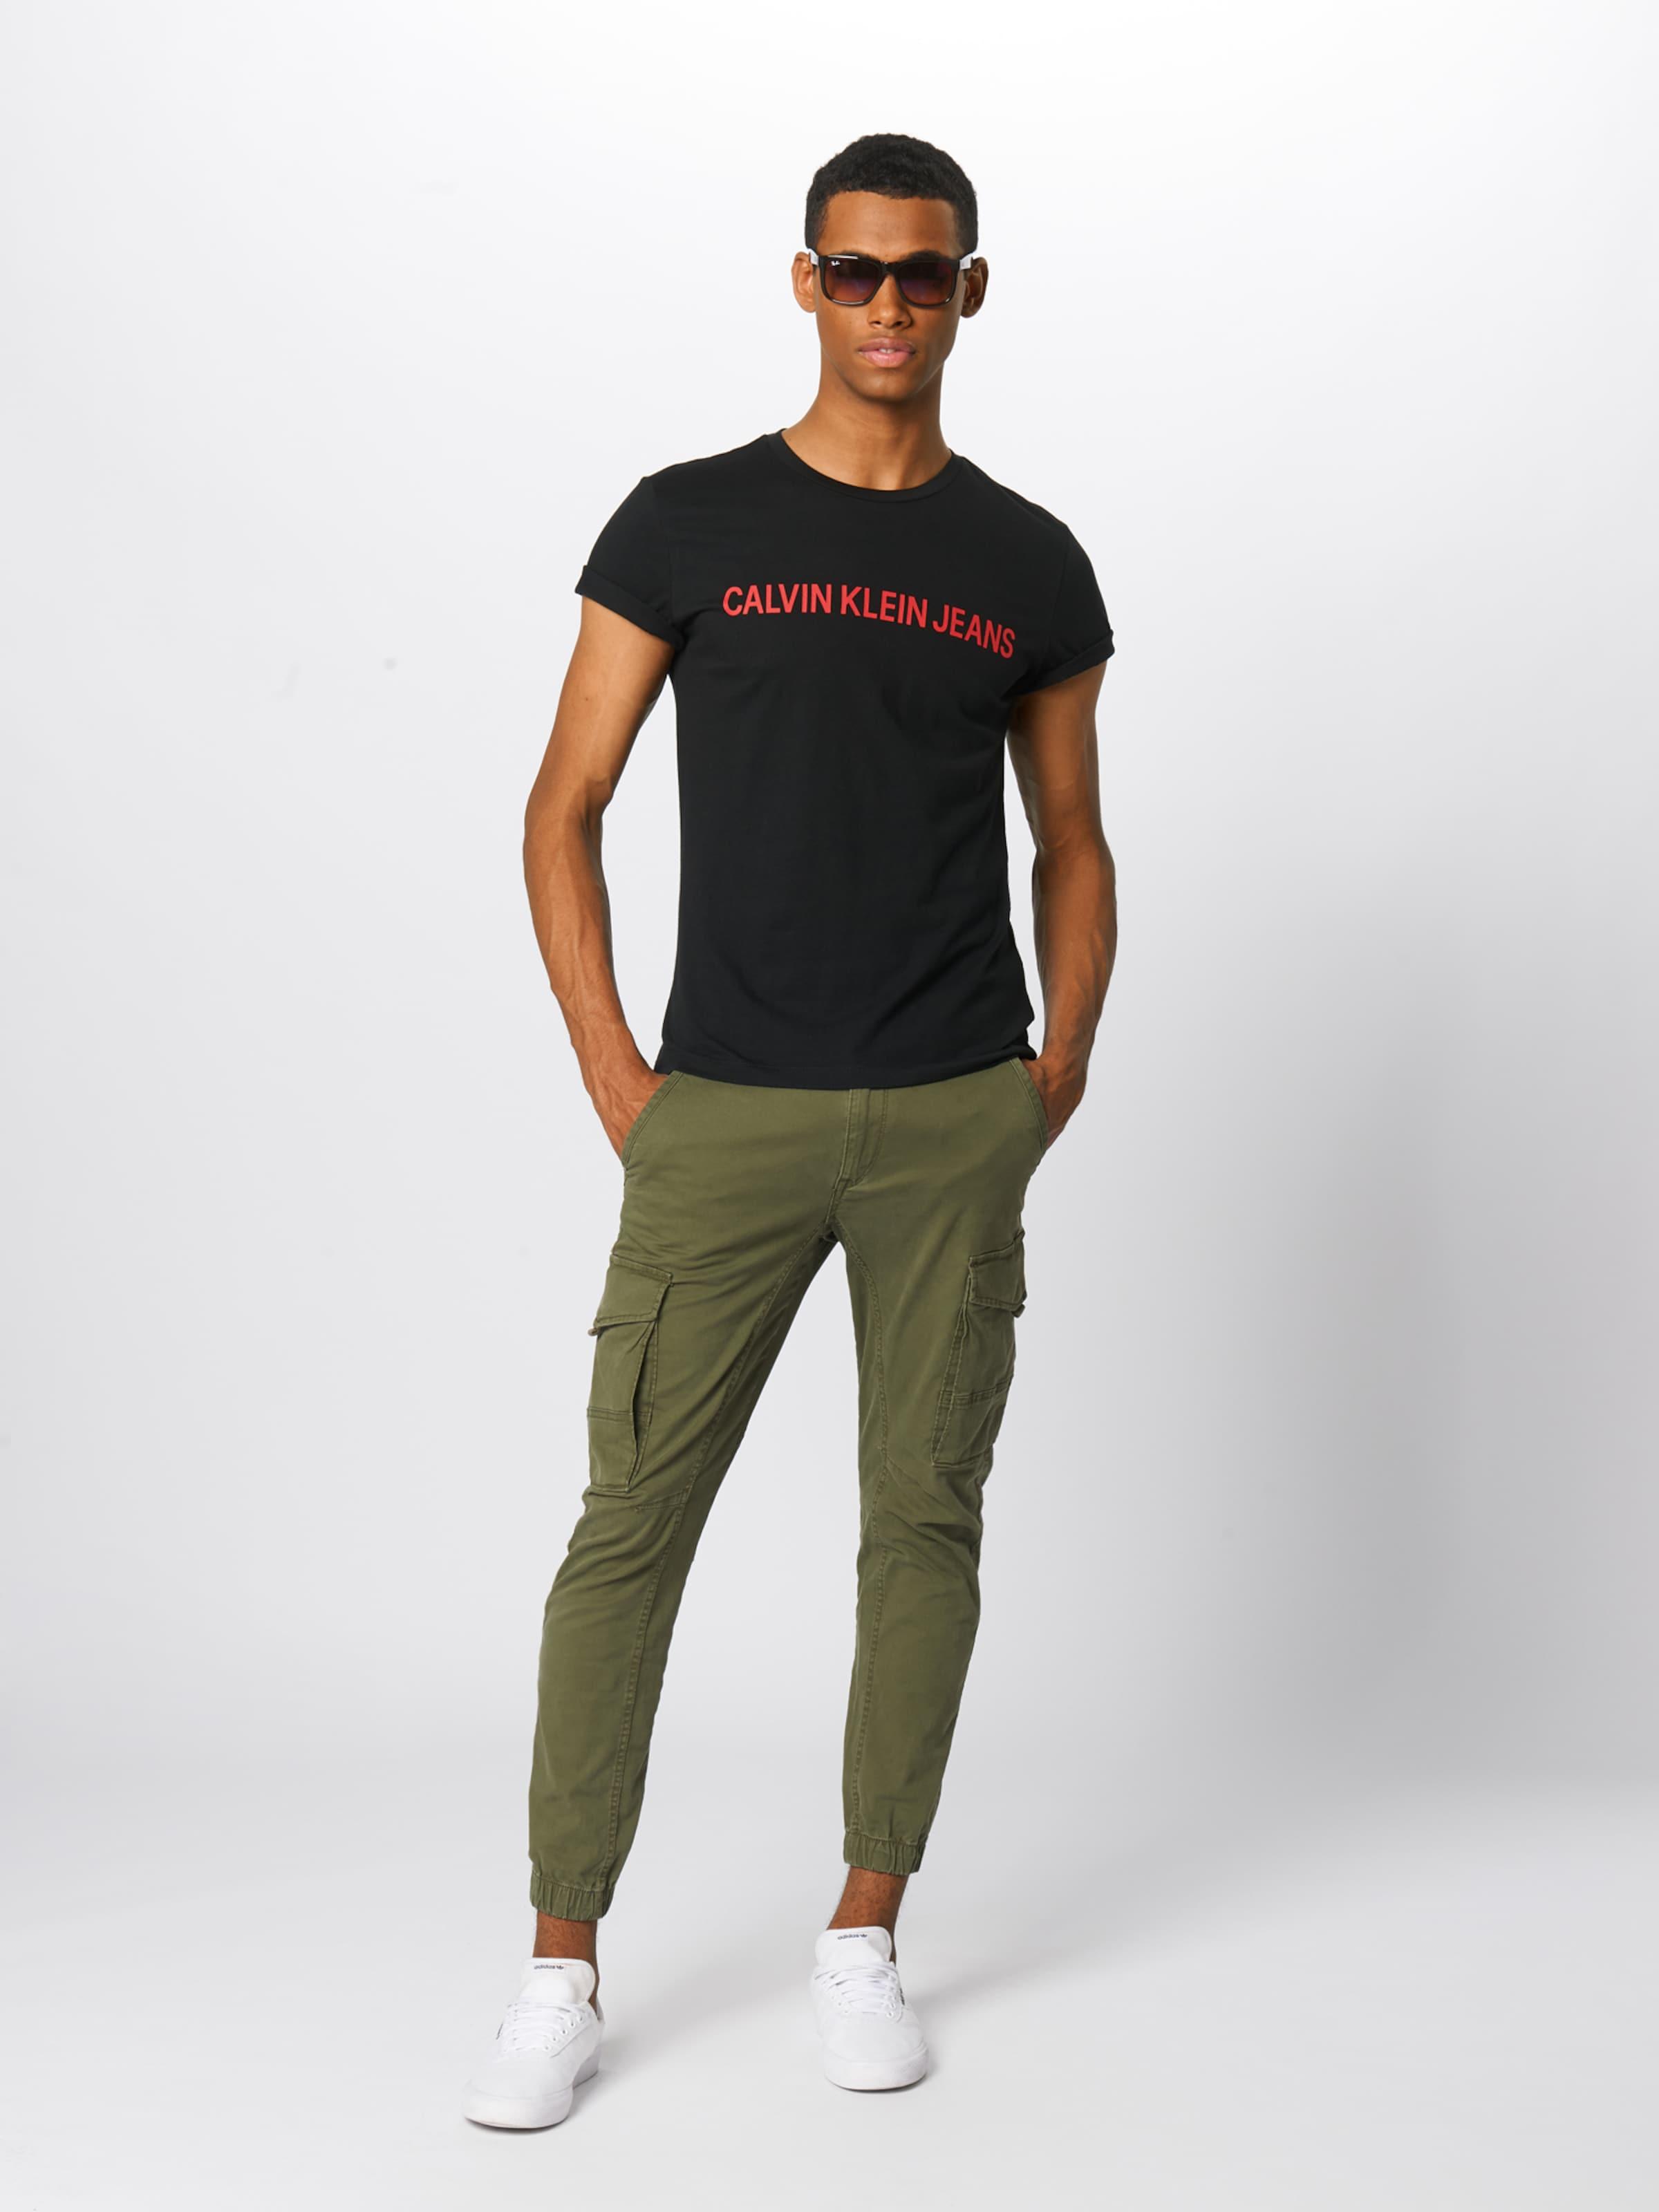 Jeans 'institutional RotSchwarz Calvin Logo T Klein shirt Slim In Tee' 1JTK3lFc